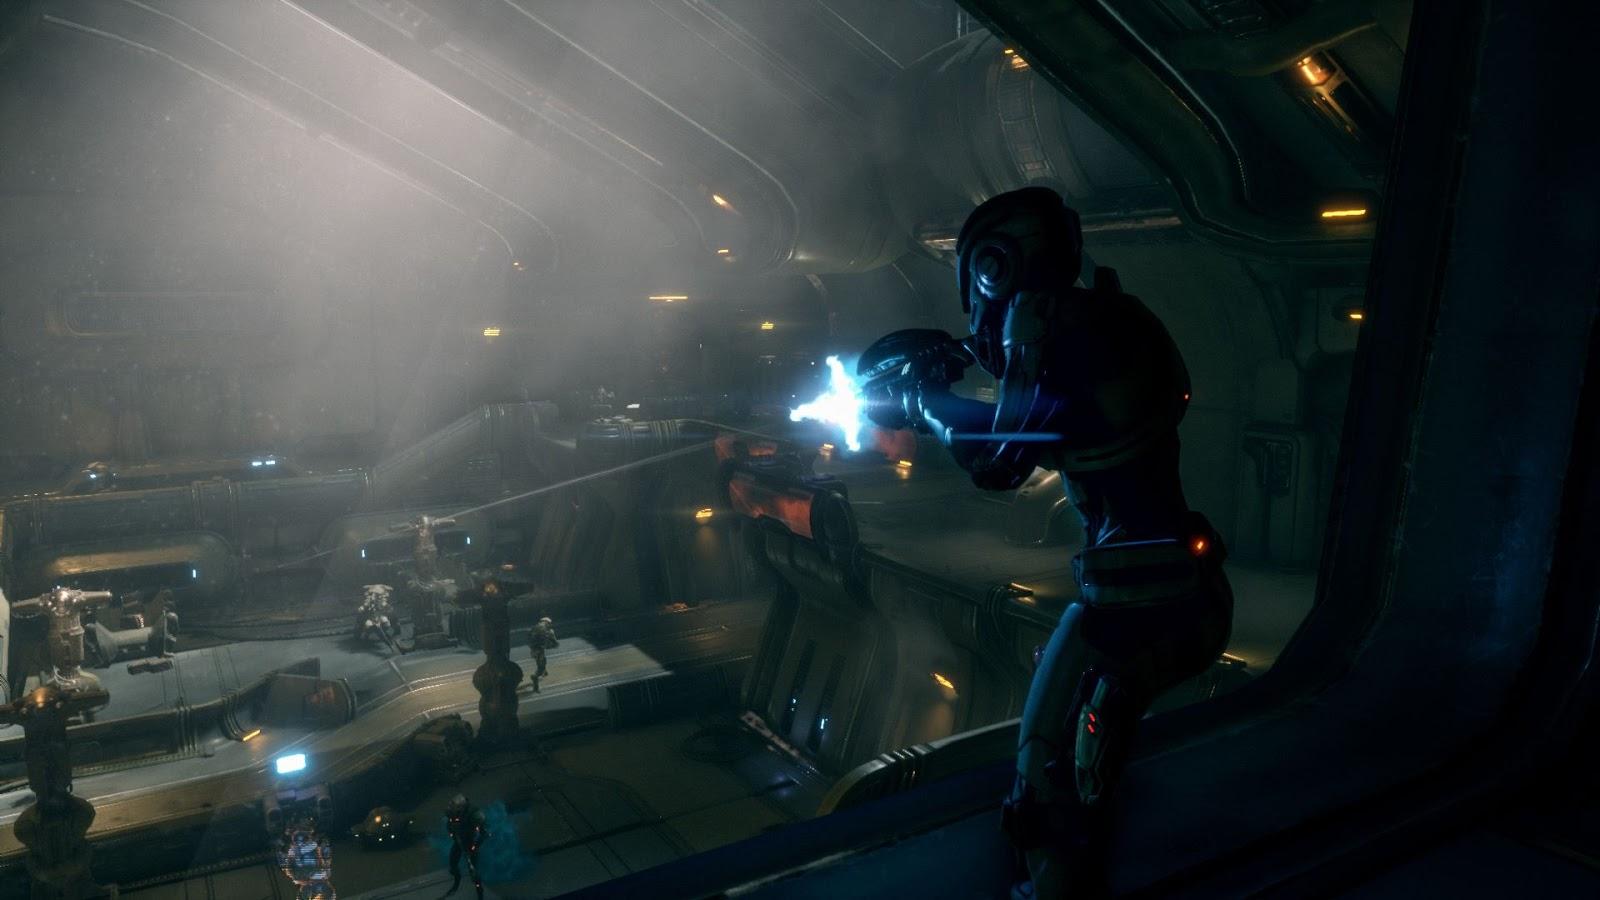 Mass Effect Andromeda ESPAÑOL PC Full + Update 1.0.0.5 + CRACKFIX (CPY) + REPACK PROPER 9 DVD5 (JPW) 7